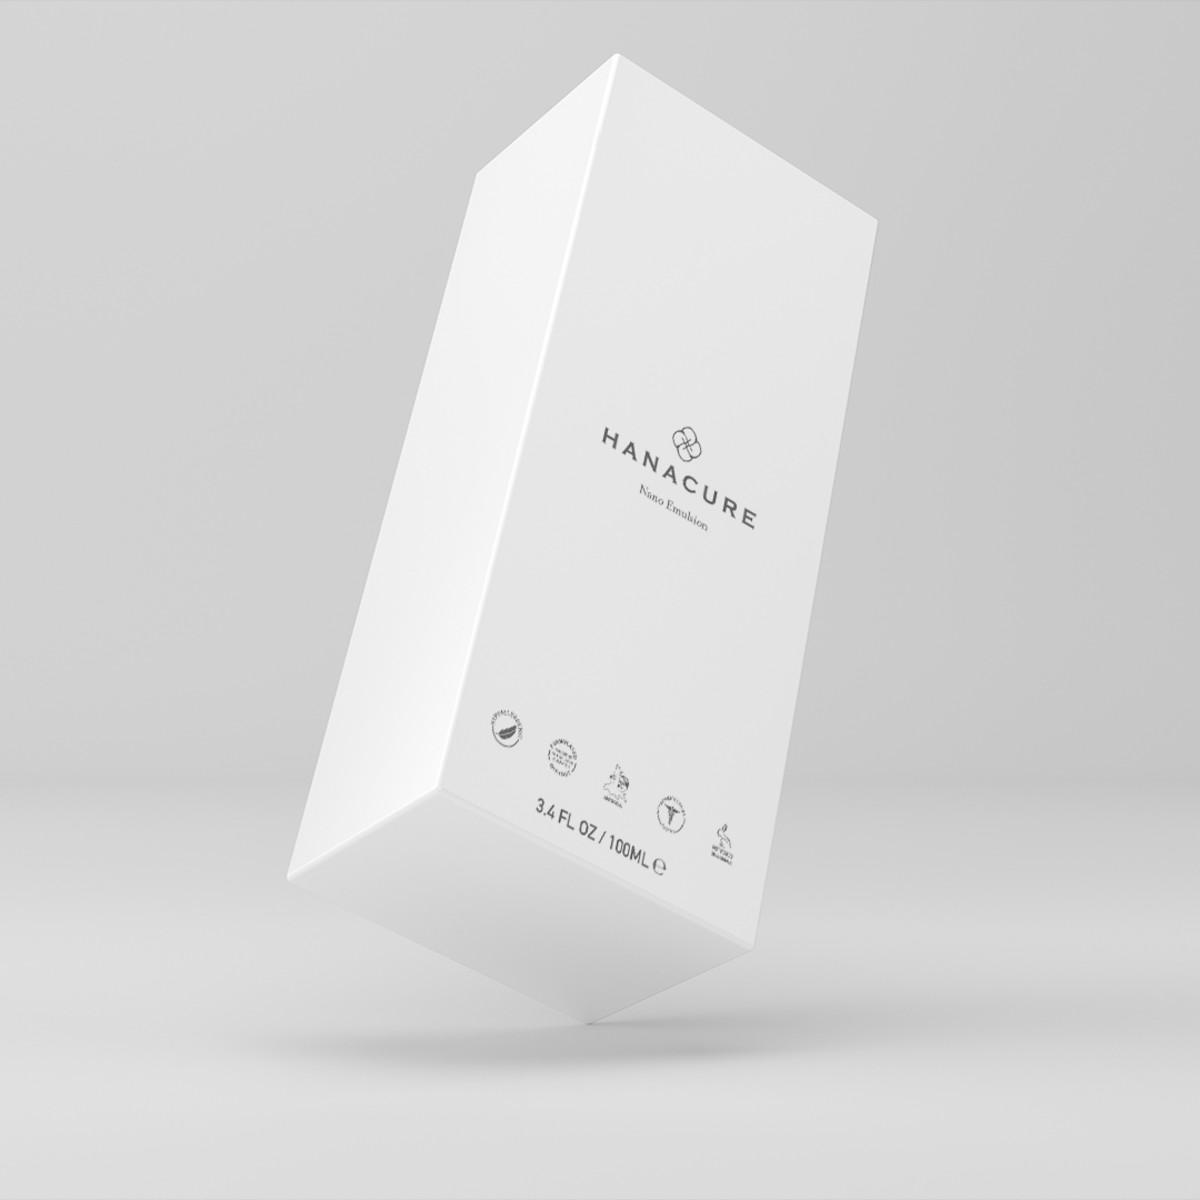 Hanacure Nano Emulsion